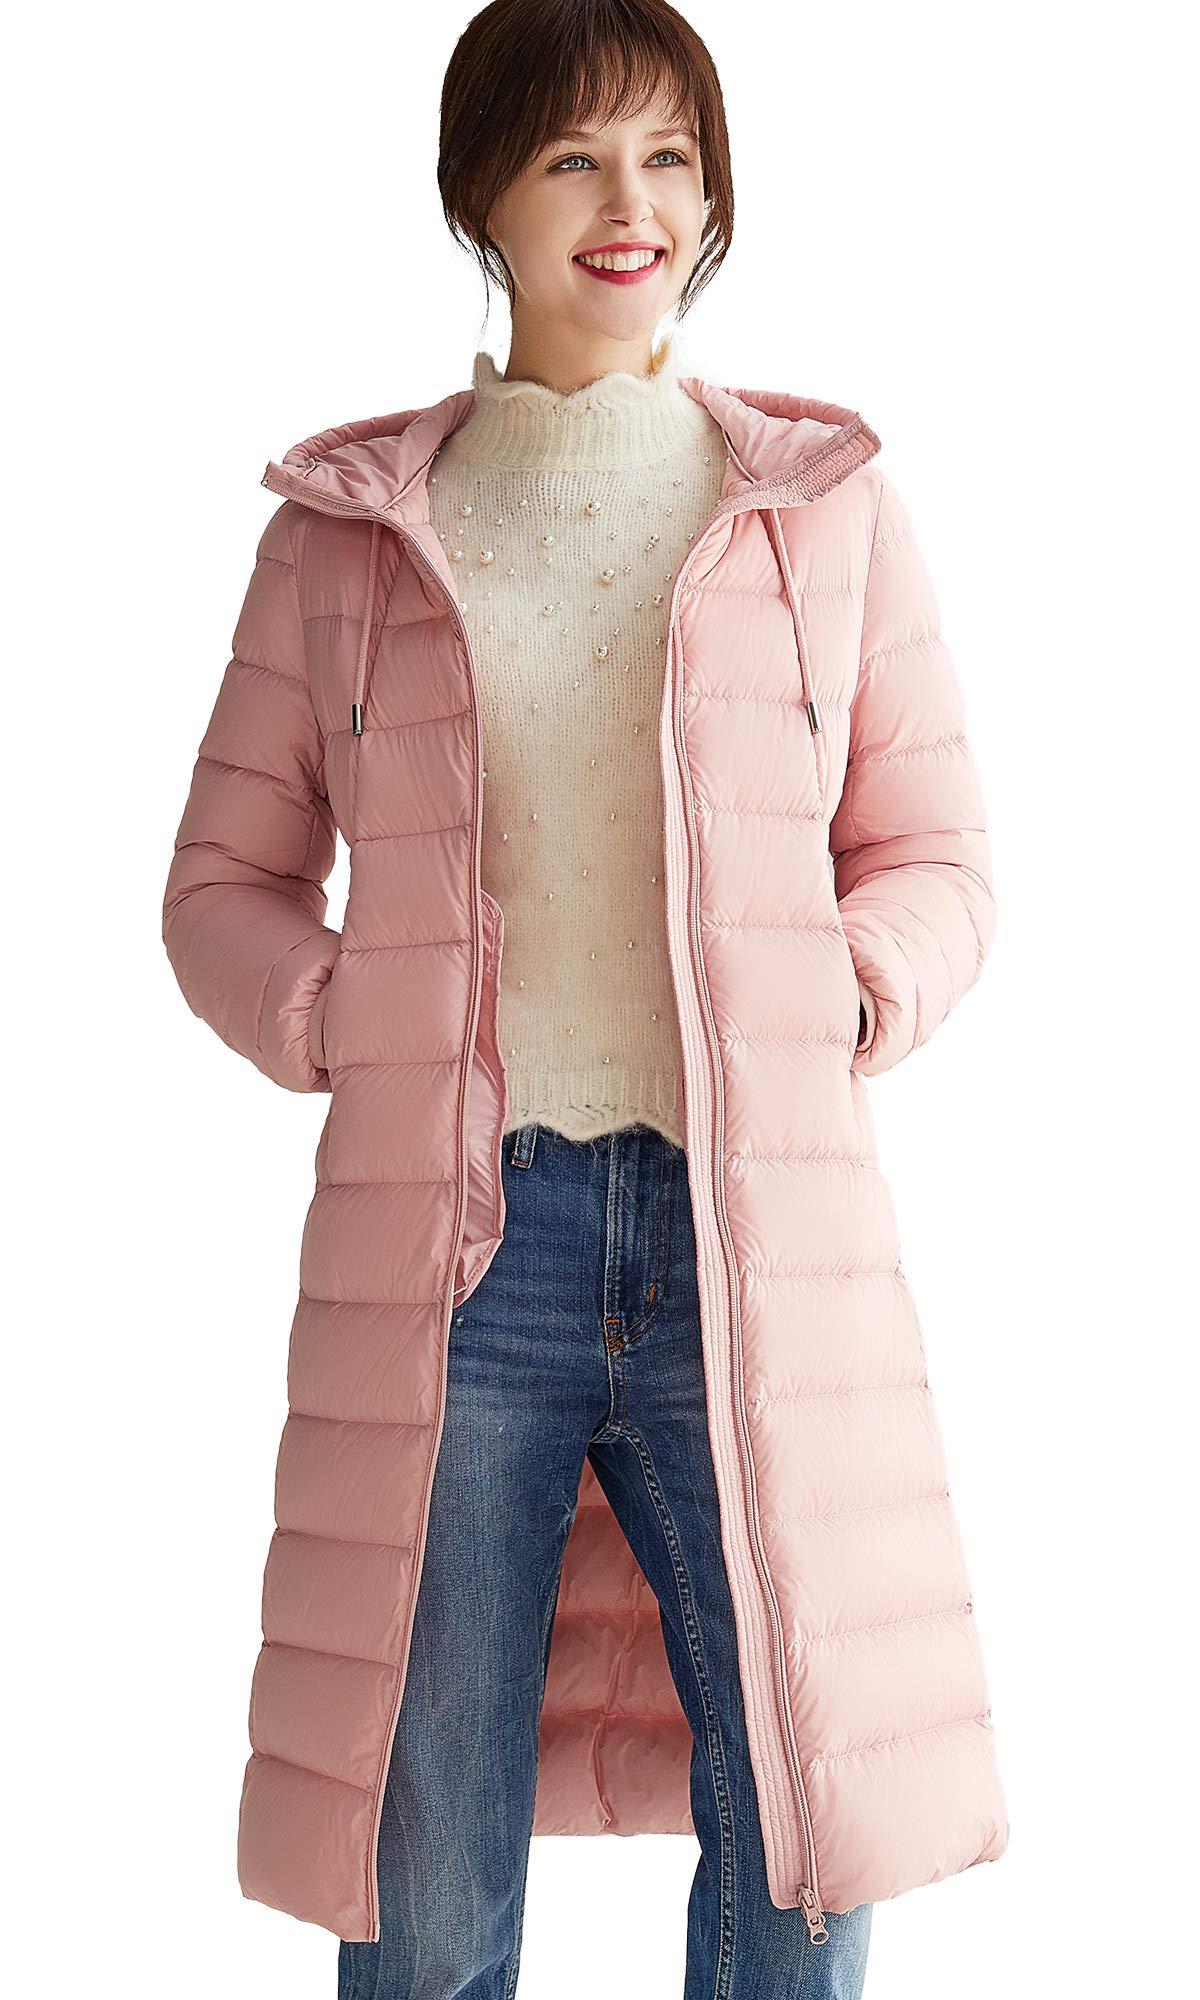 VUTOLEE Women Lightweight Down Jacket Coat- Ultralight Packable Long Down Puffer Coat Mid-Length Hooded Down Outwear L03